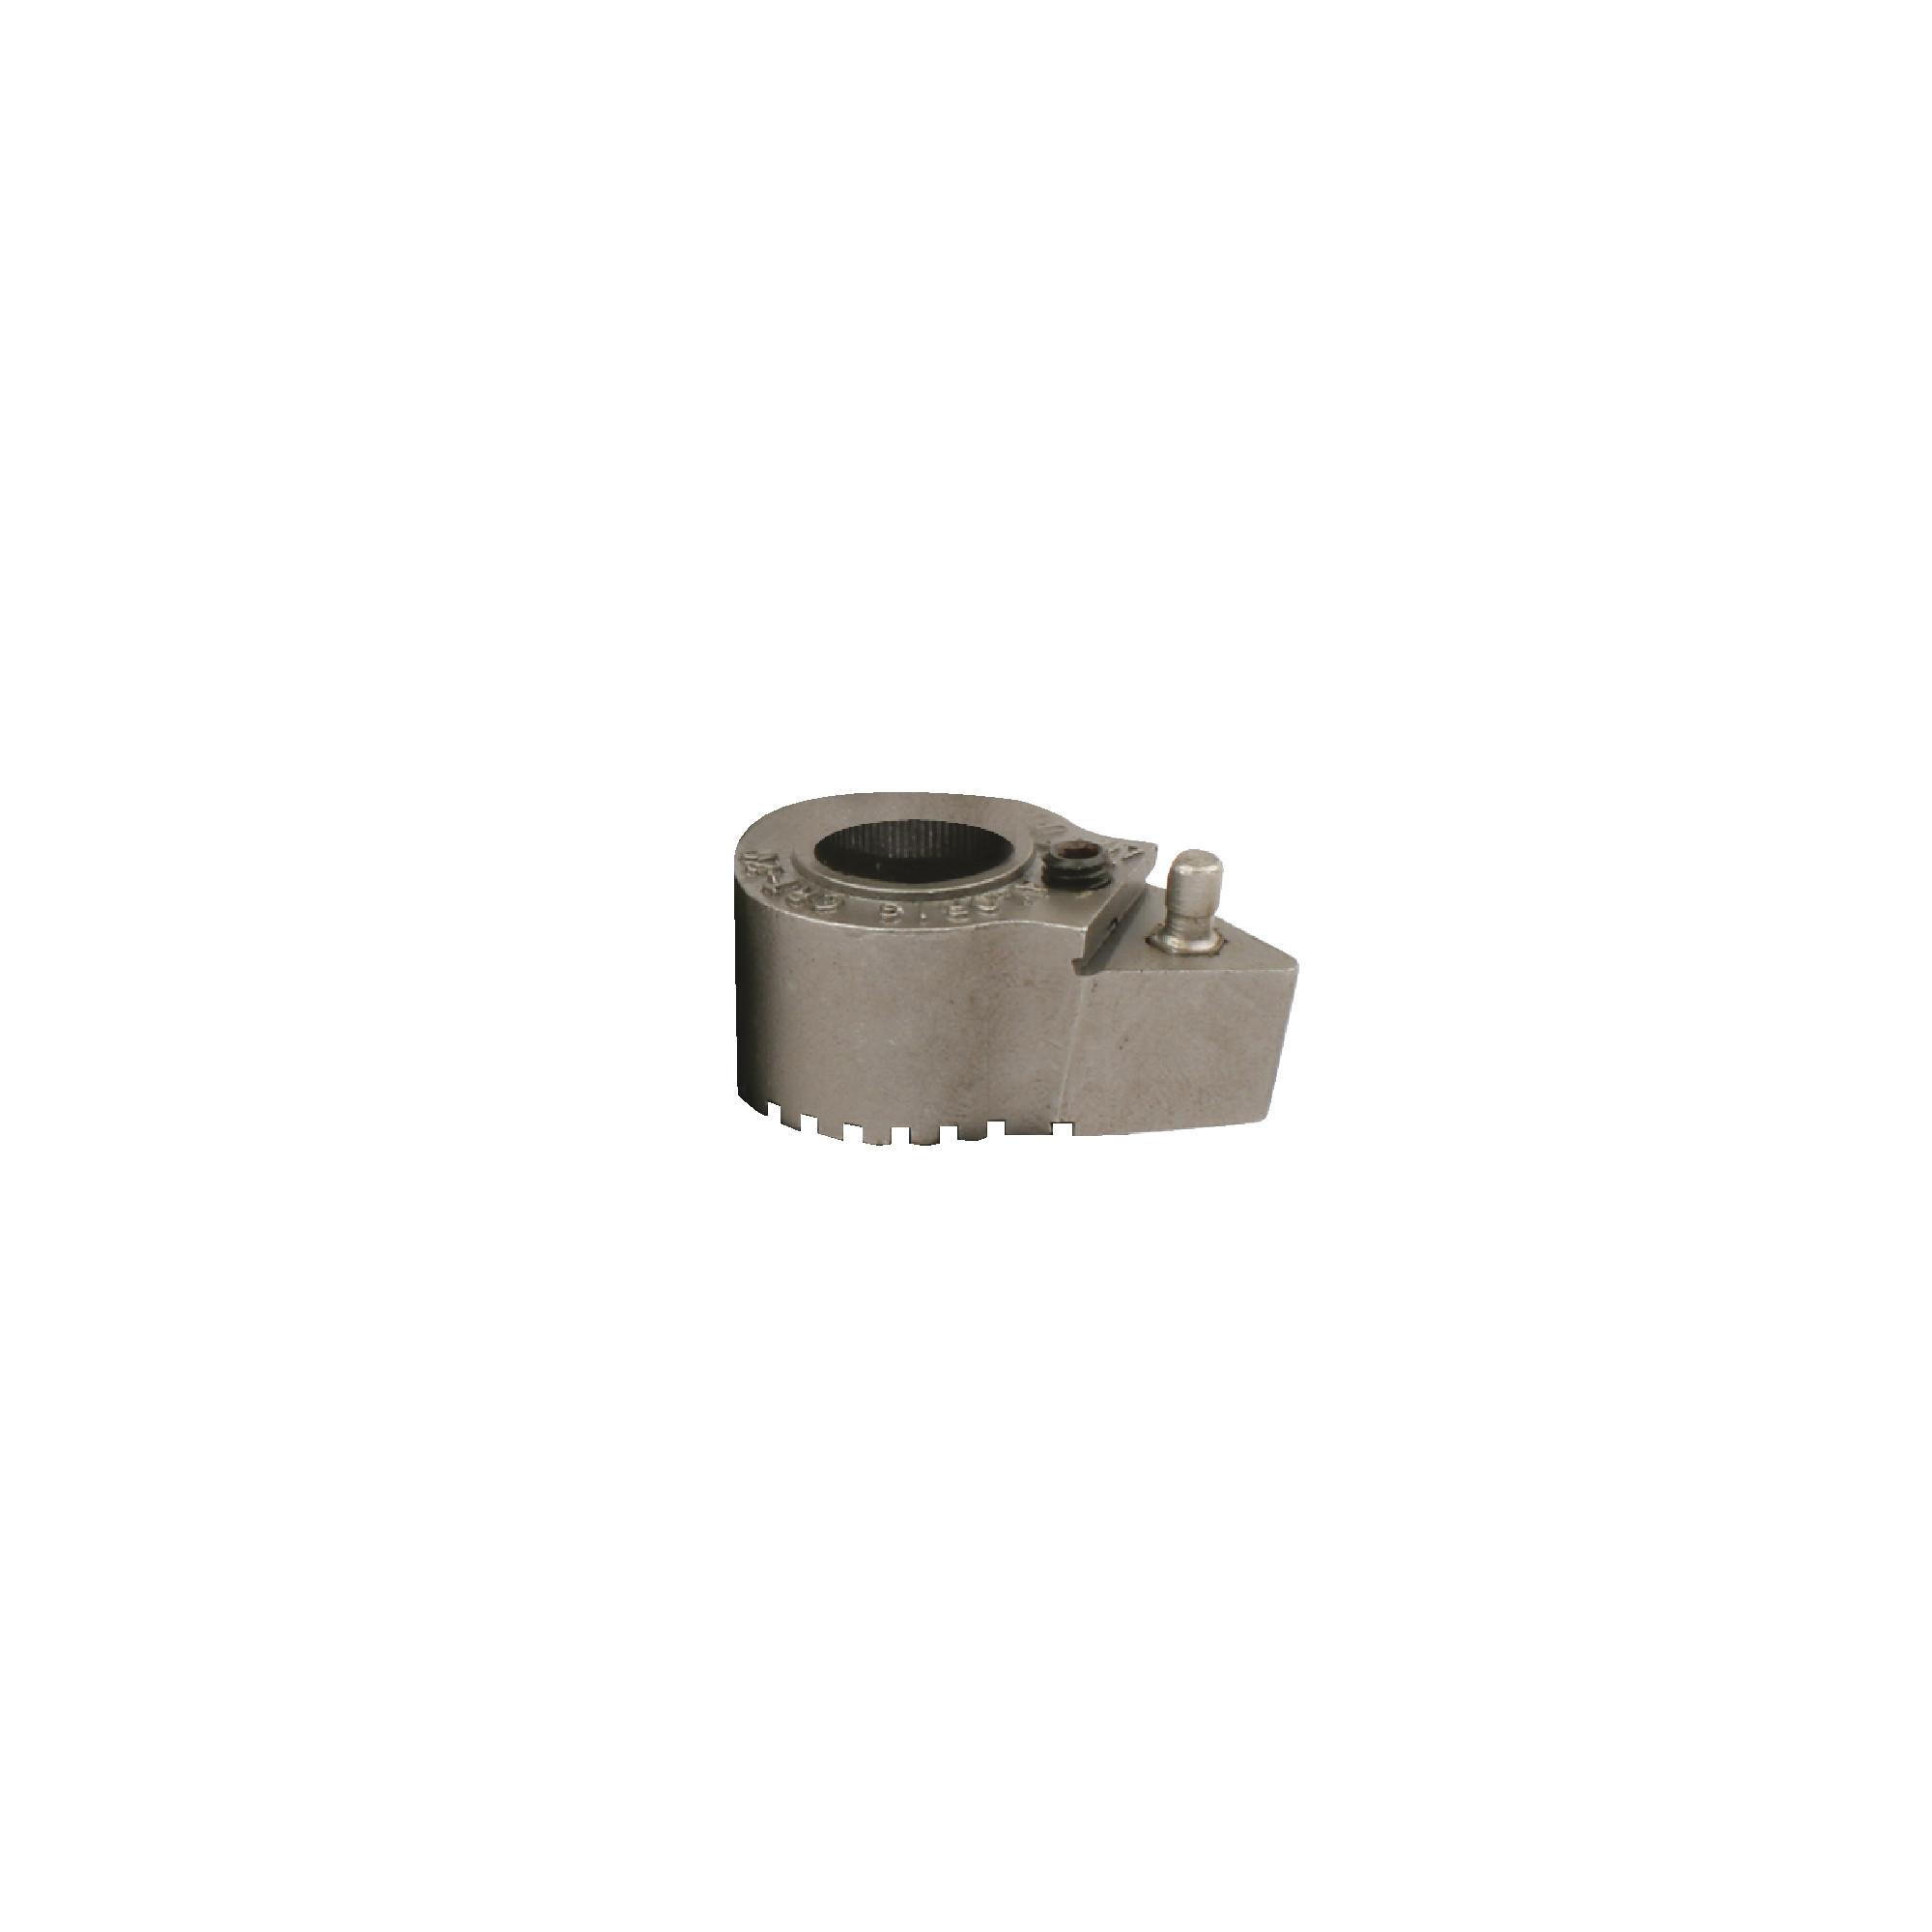 CRT-20 Cartridge for #20 Universal Toolholder